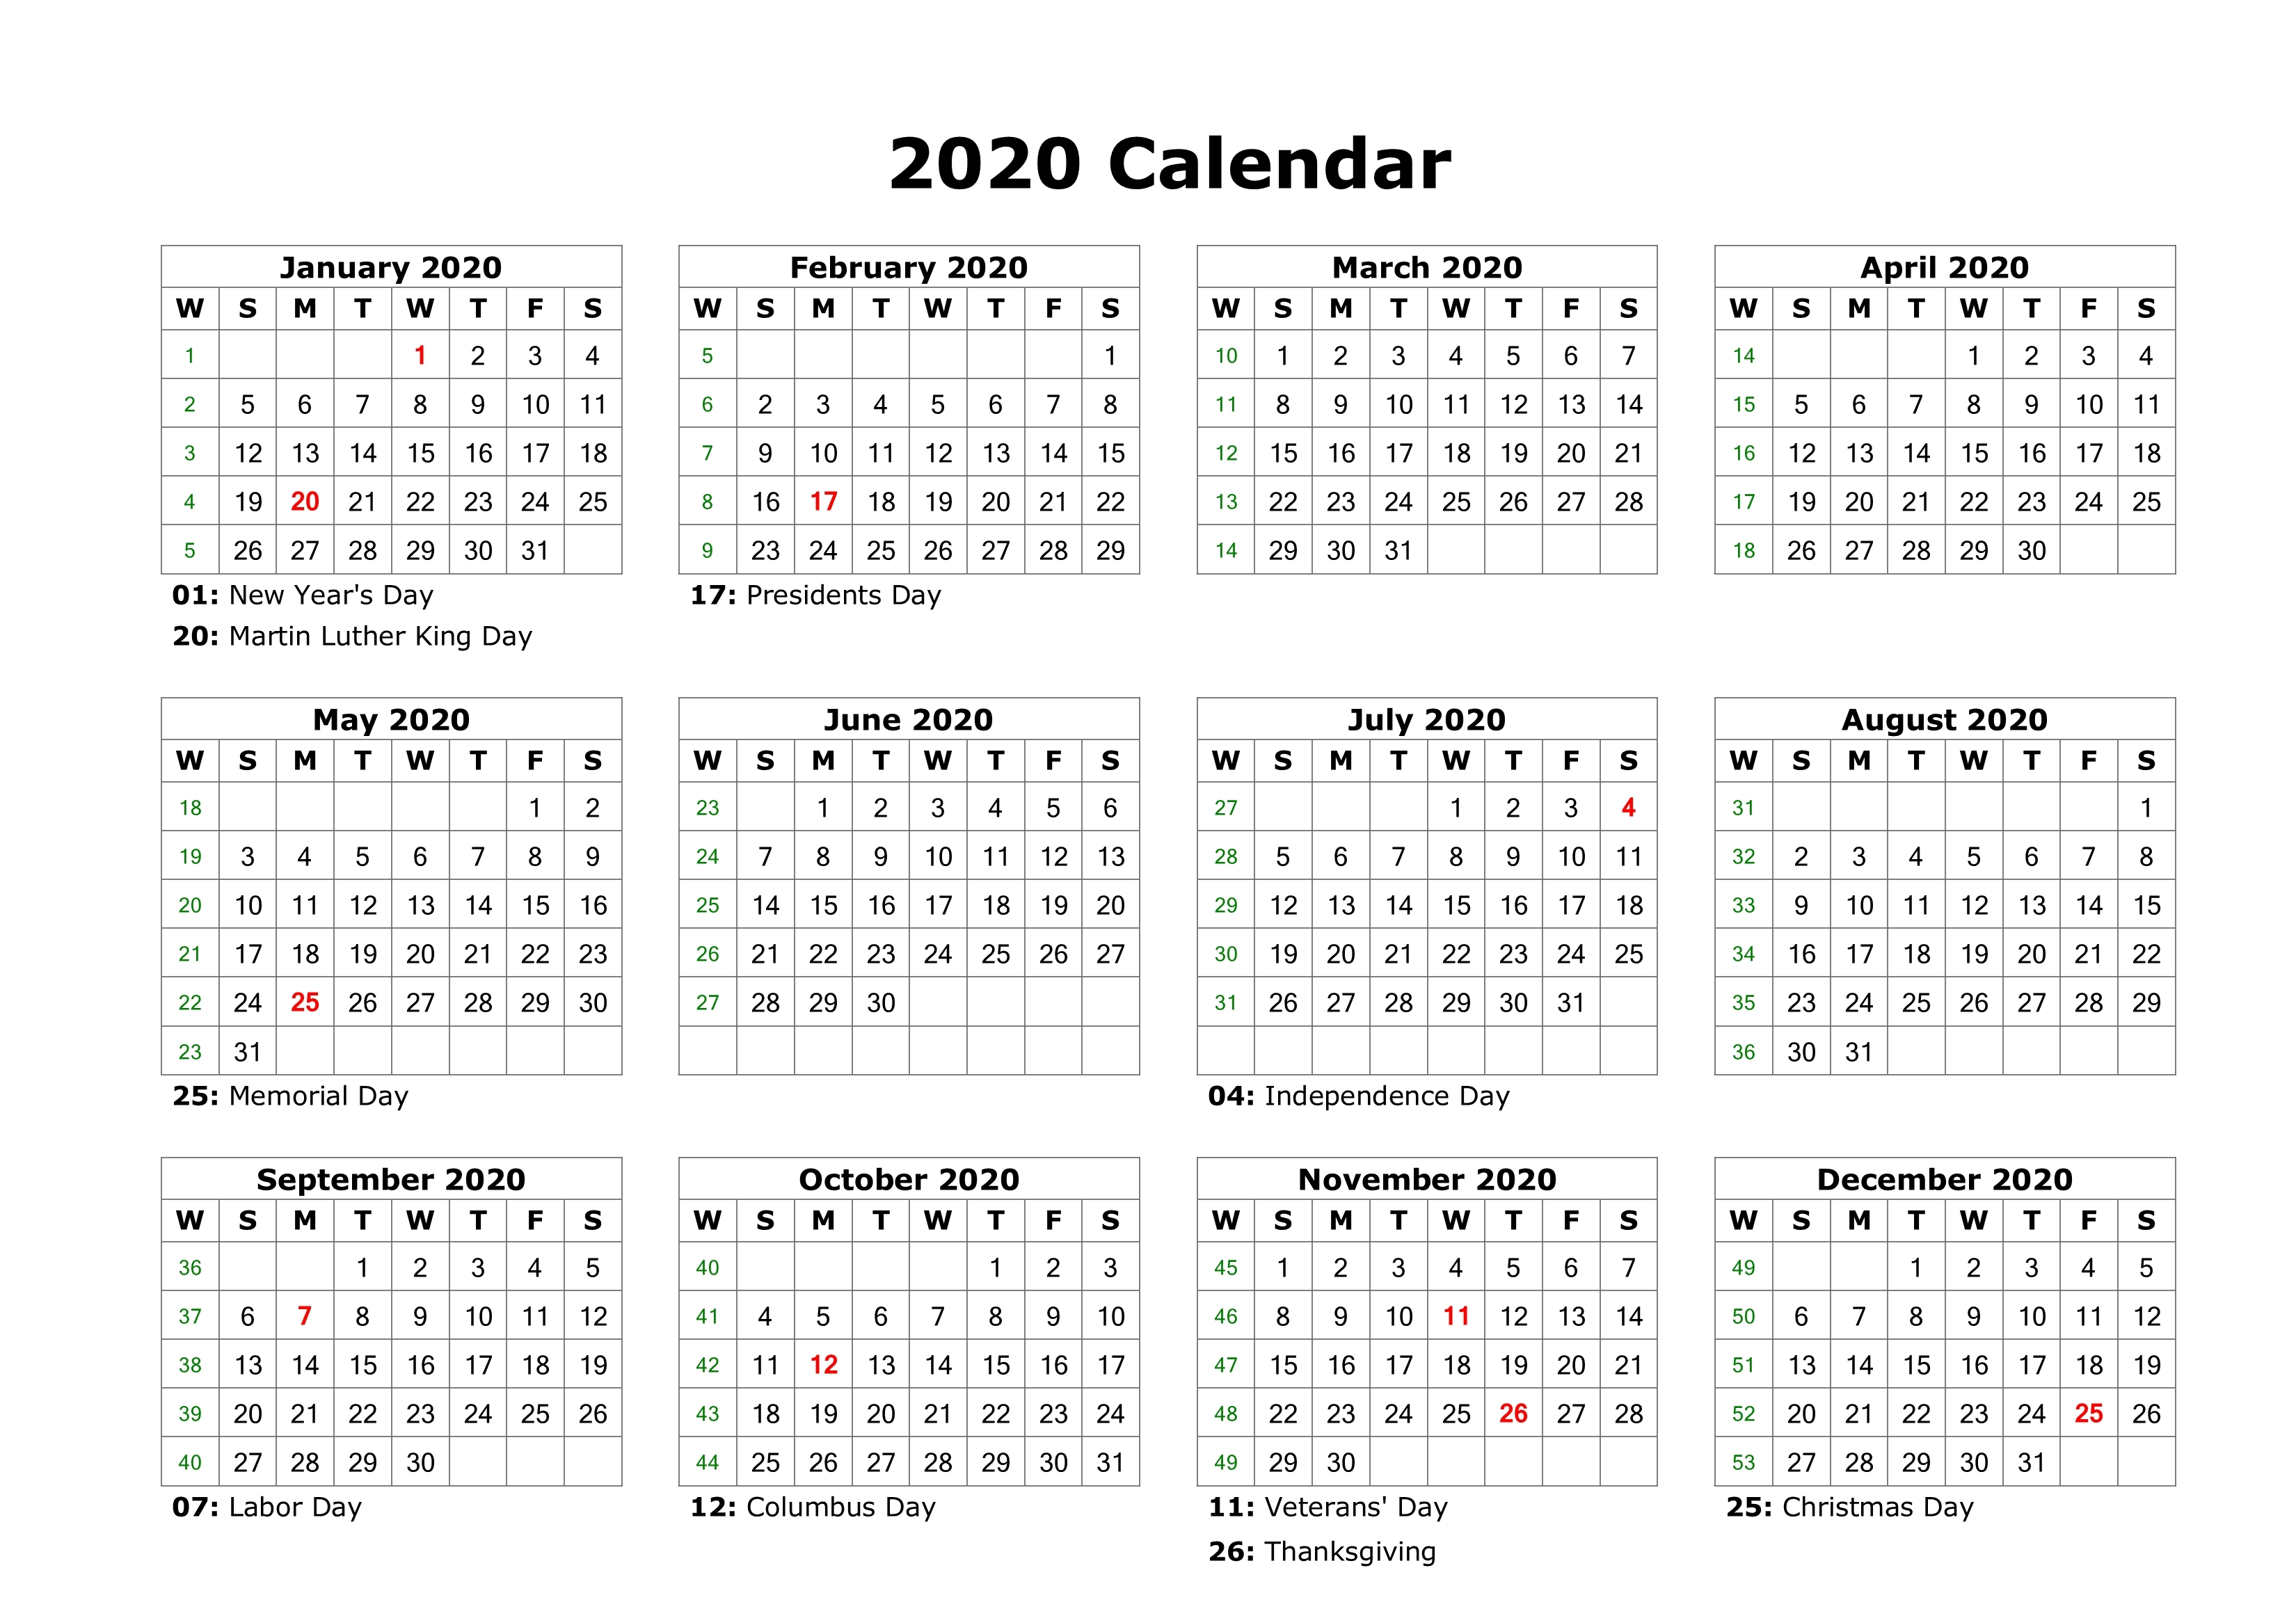 Free Editable 2020 Calendar Printable Template intended for 2020 Employee Attendance Calendar Free